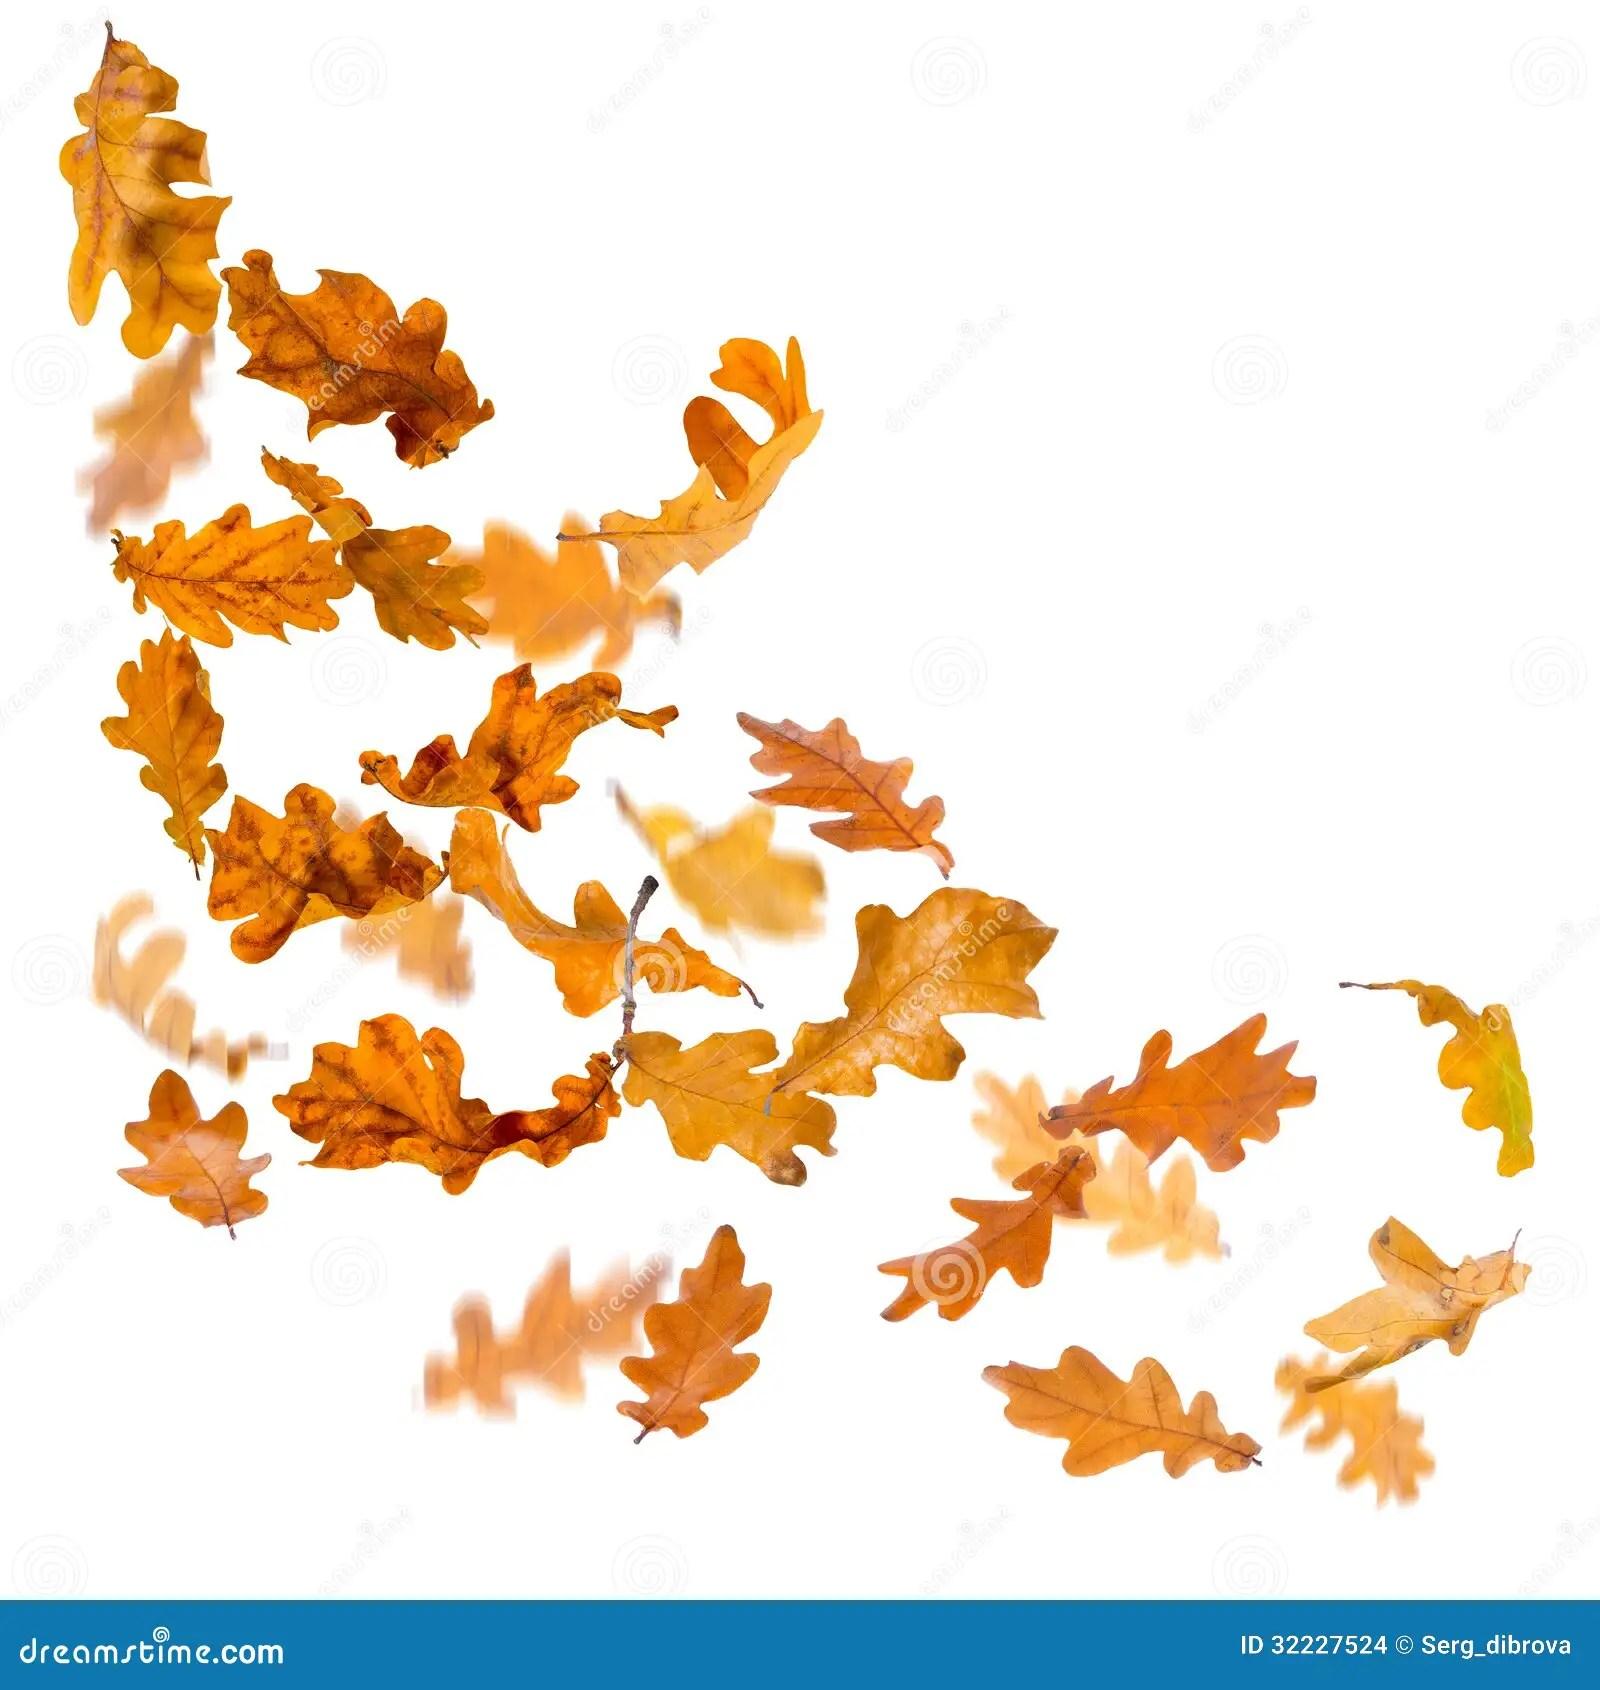 Falling Leaves Animated Wallpaper Oak Leaves Falling Stock Images Image 32227524